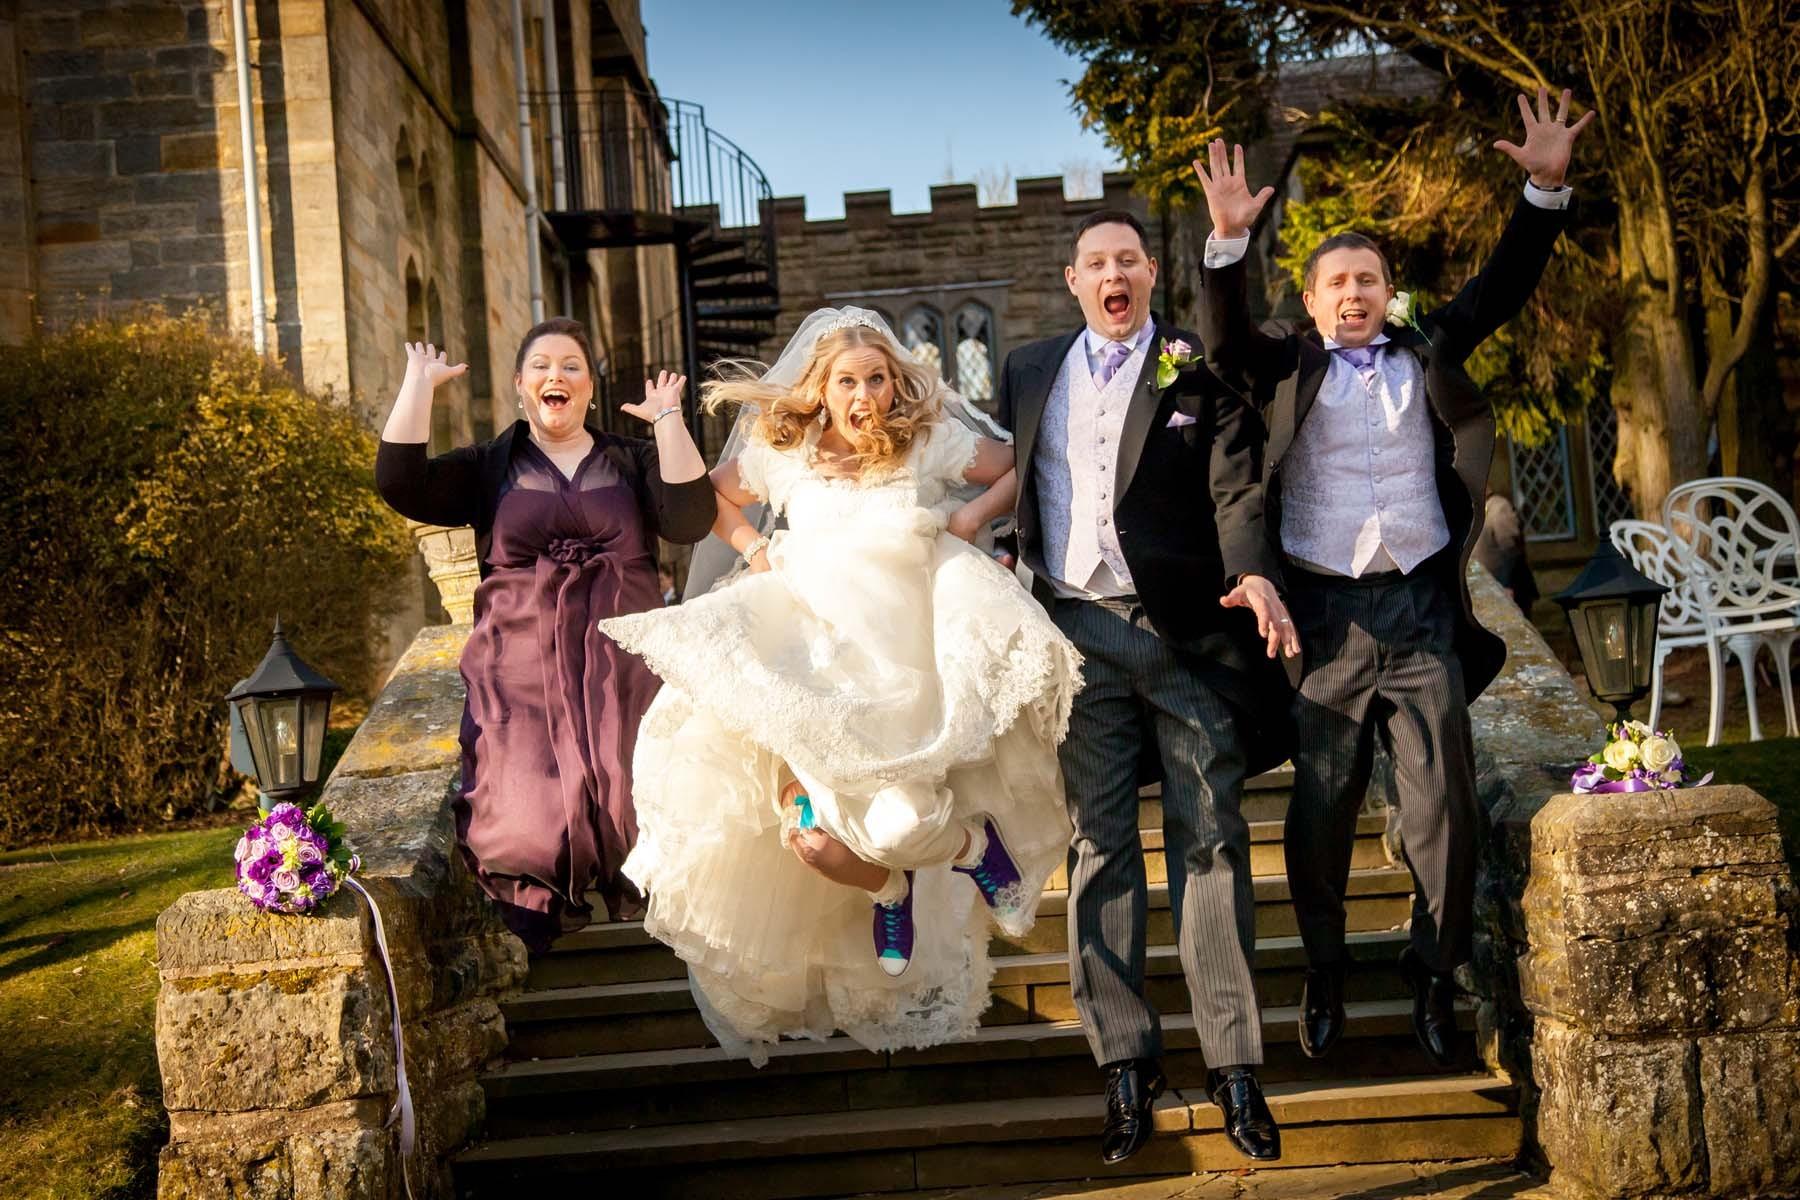 Sussex & Surrey Wedding Photographer - Guests & Groups (12)